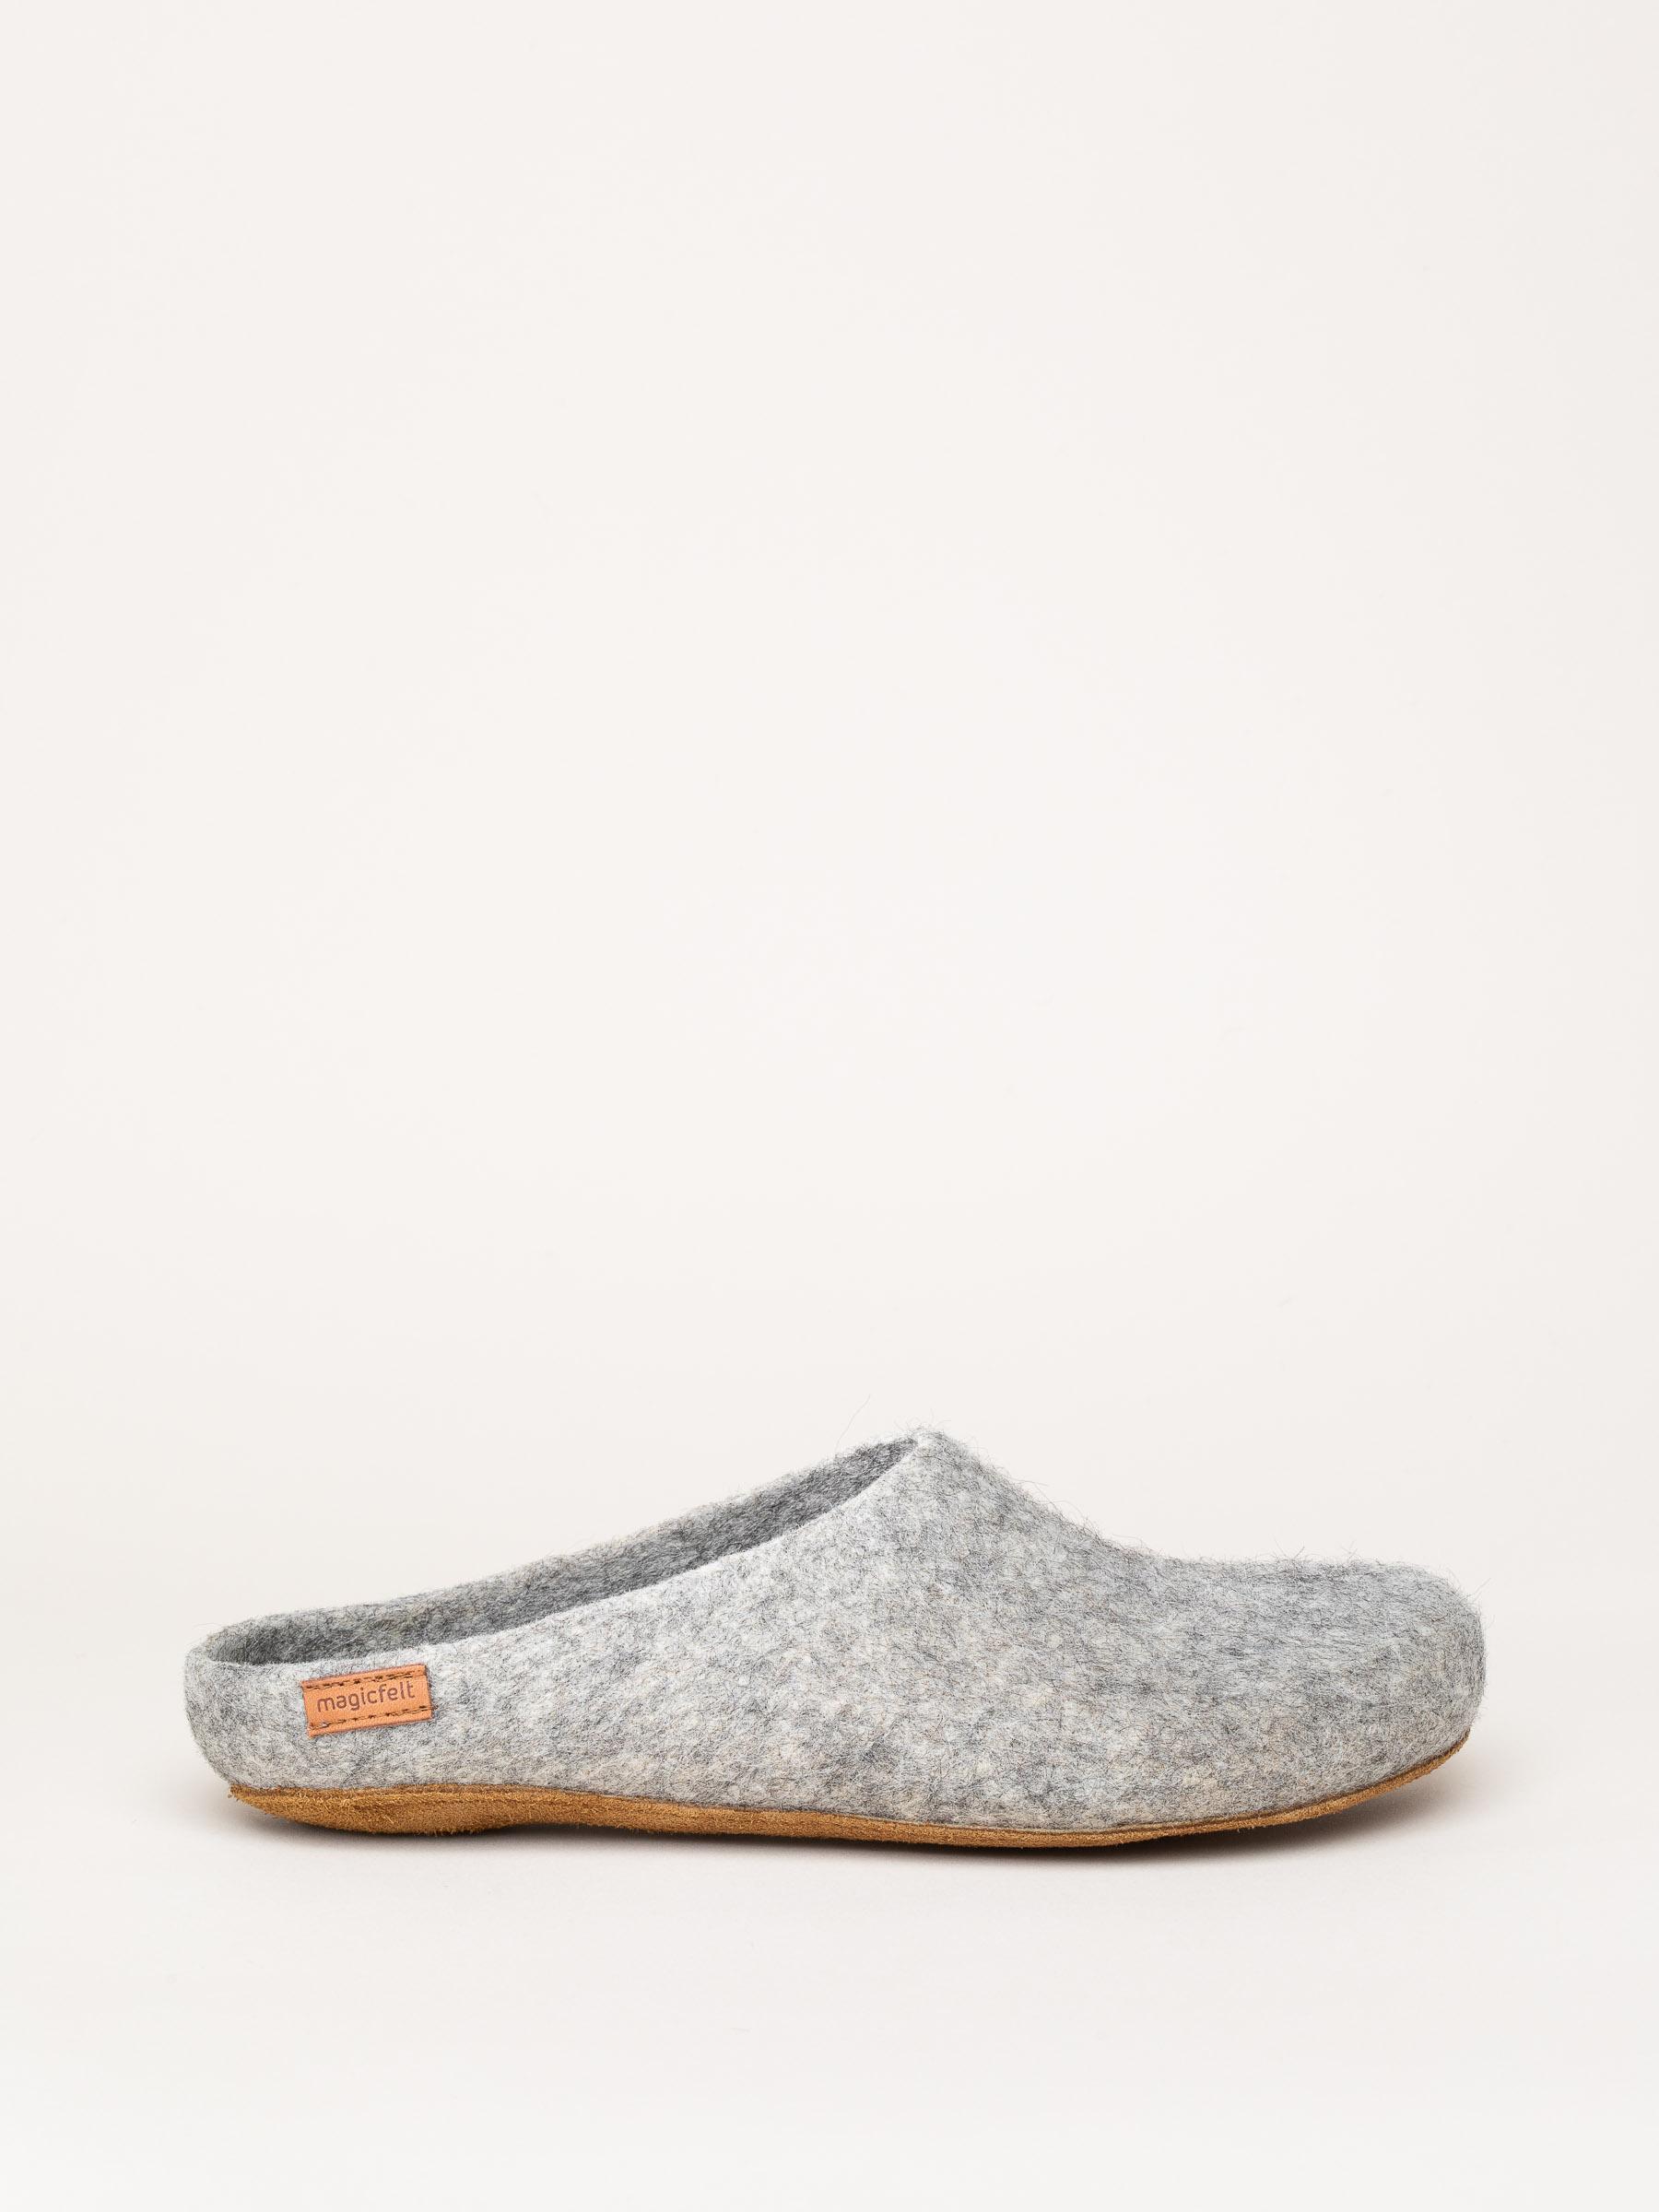 AR 713 rare wool slippers